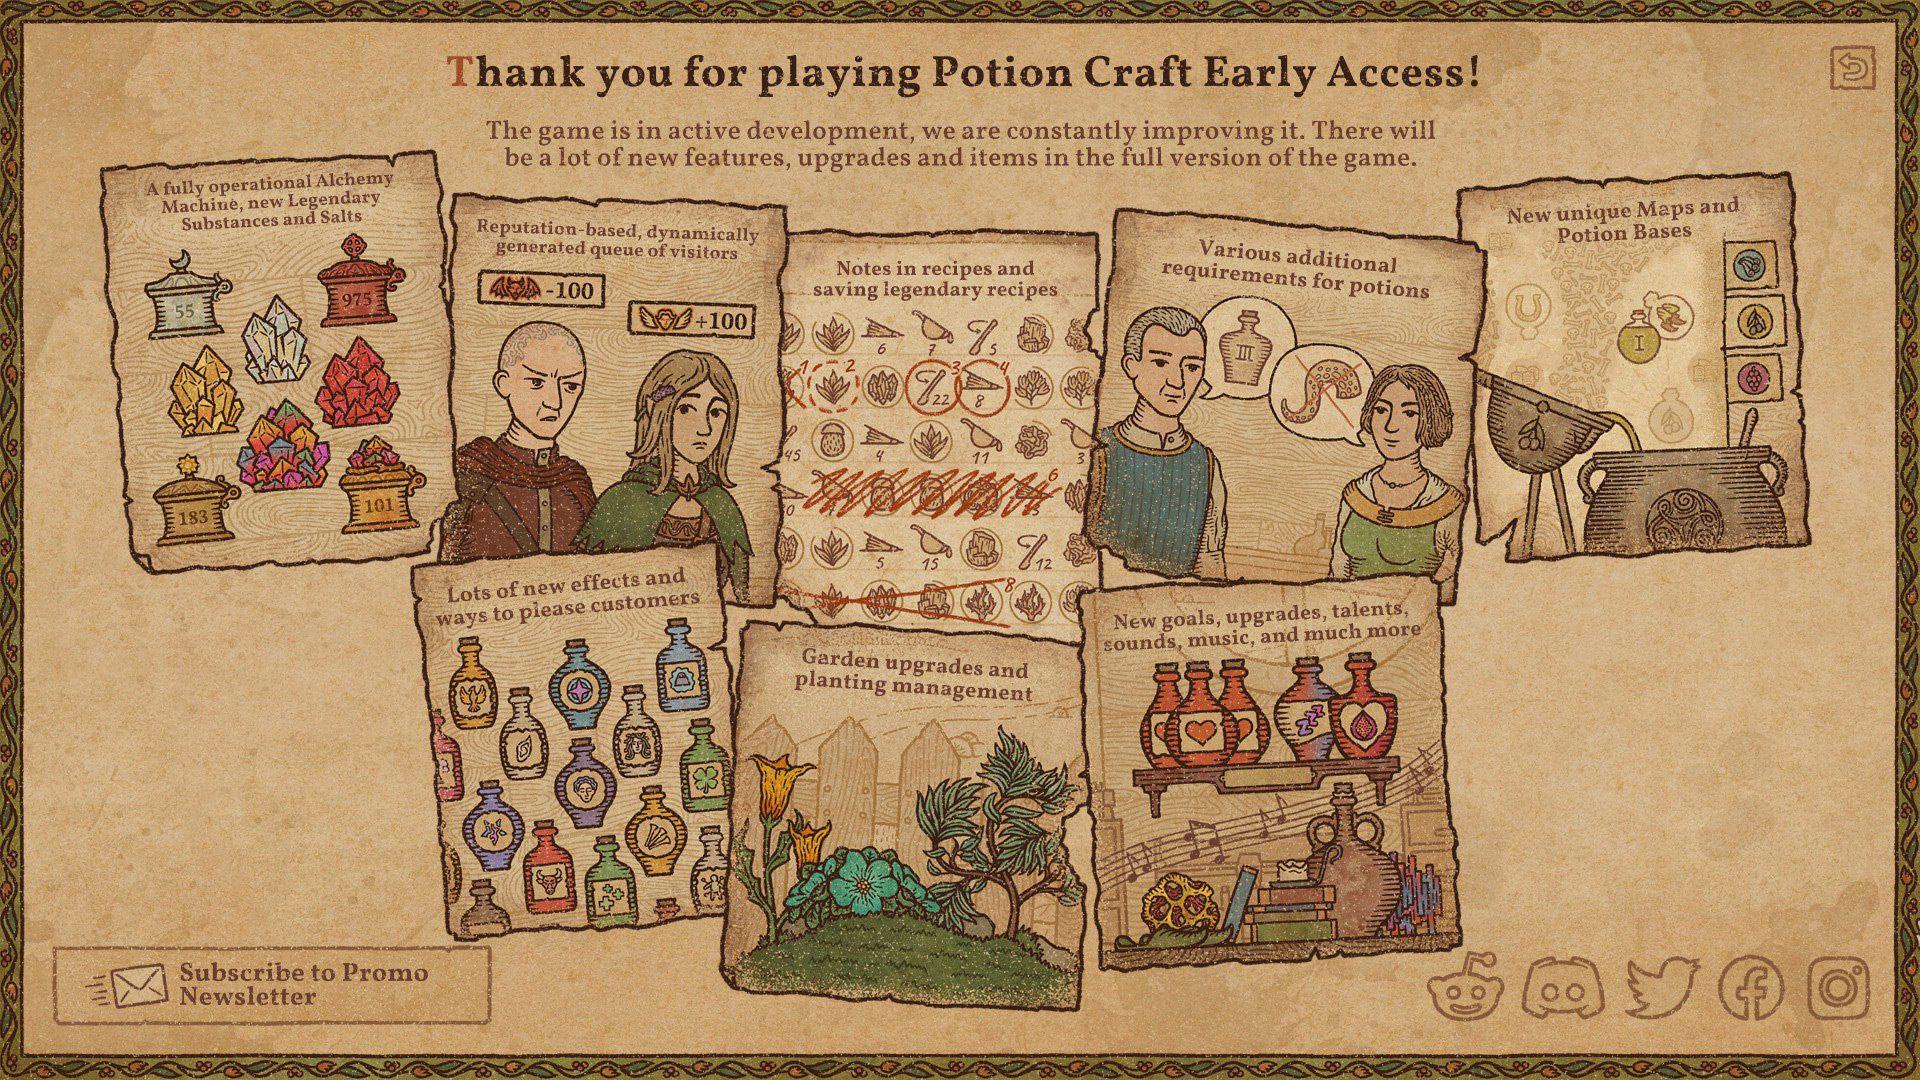 The future content roadmap for Potion Craft: Alchemist Simulator